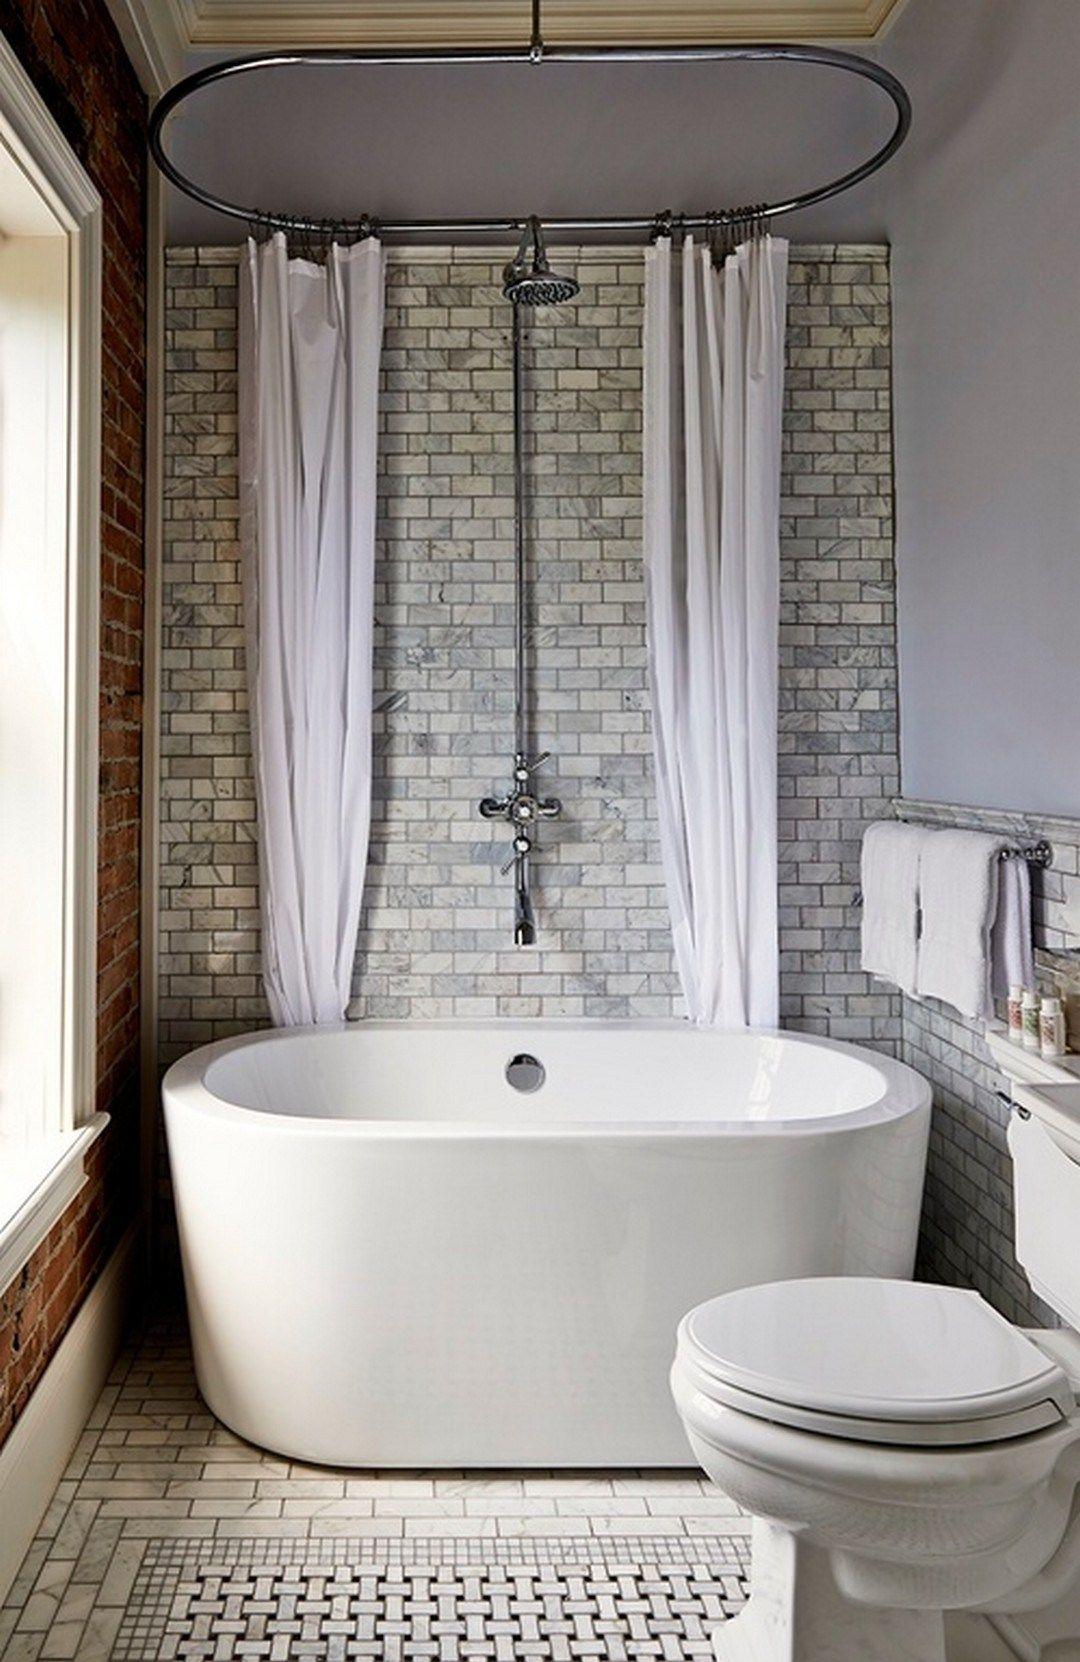 99 Small Bathroom Tub Shower Combo Remodeling Ideas 101 Bathroom Tub Shower Combo Small Bathroom With Tub Bathroom Tub Shower